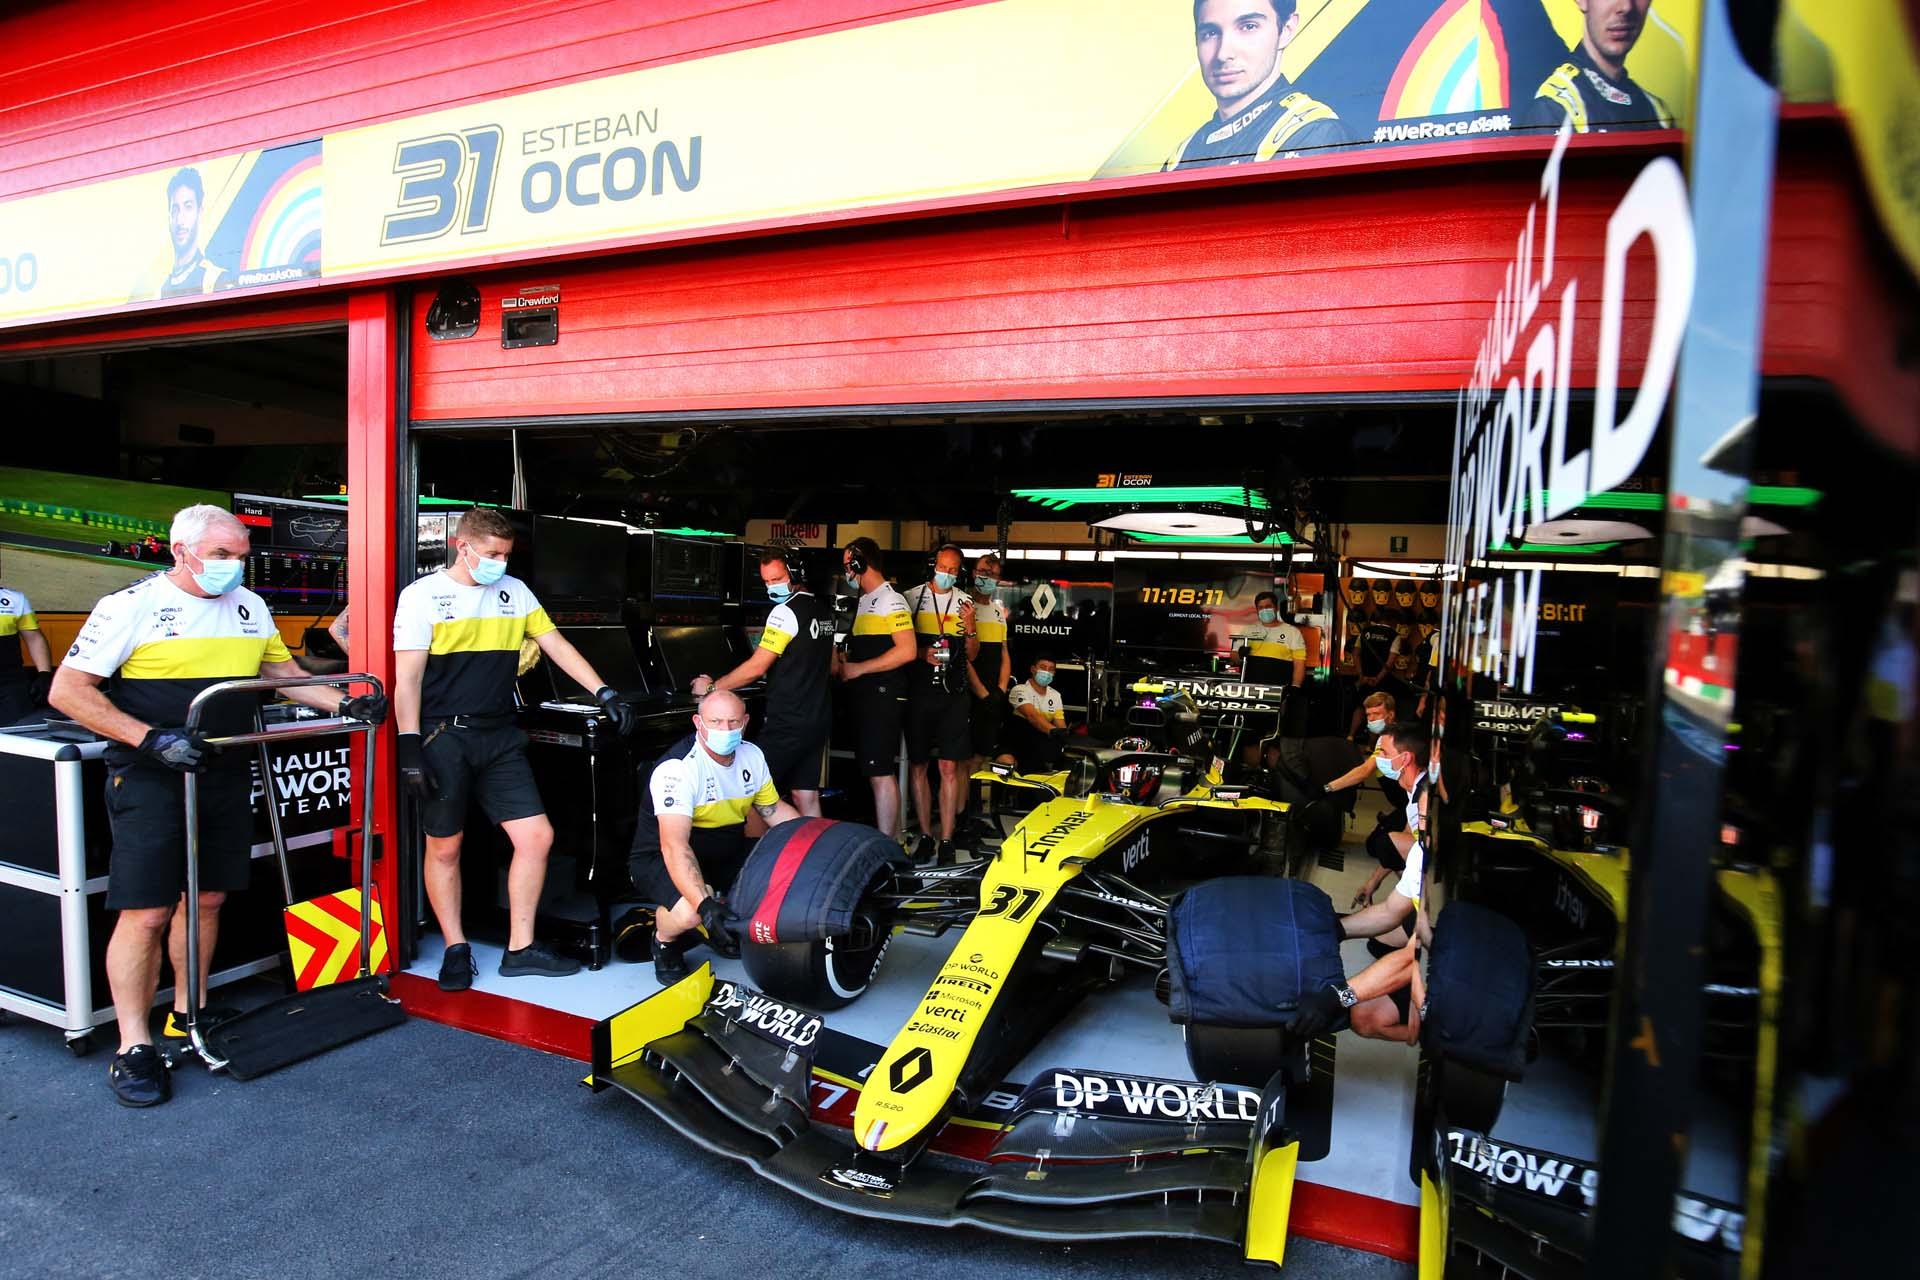 Motor Racing - Formula One World Championship - Tuscan Grand Prix - Practice Day - Mugello, Italy